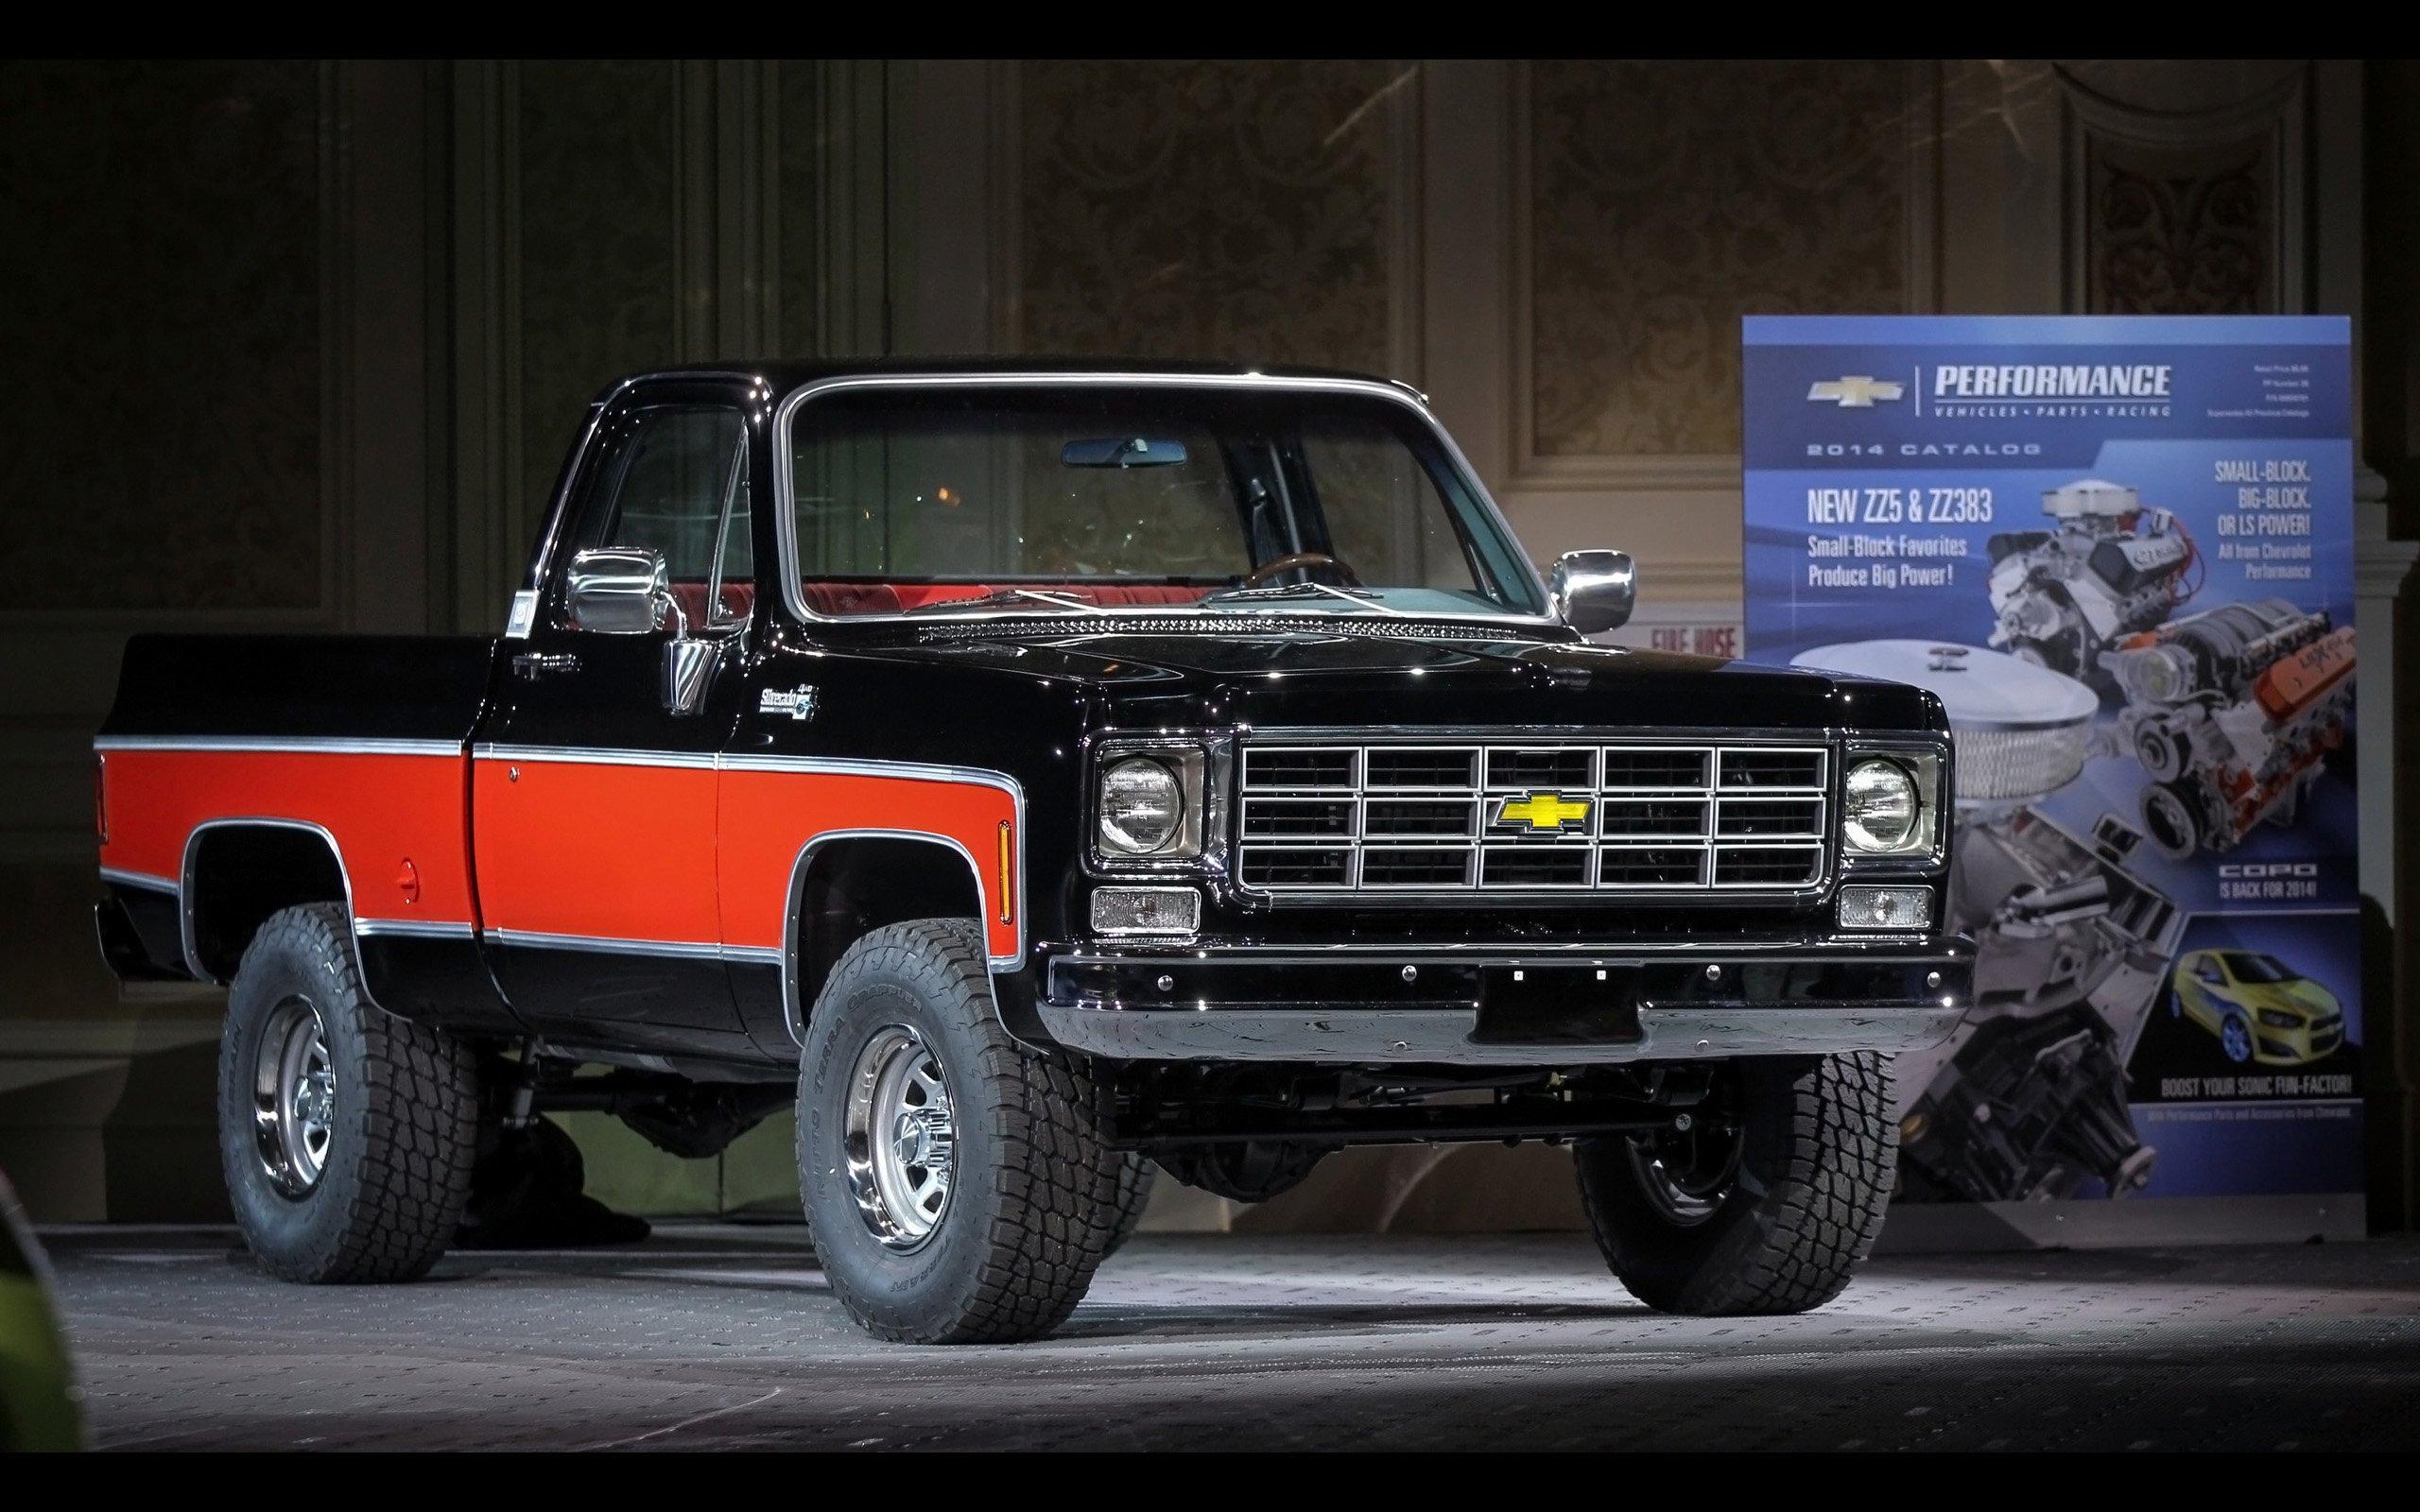 Truck Concepts at SEMA   1978 4x4 Pickup   3   2560x1600   Wallpaper 2560x1600